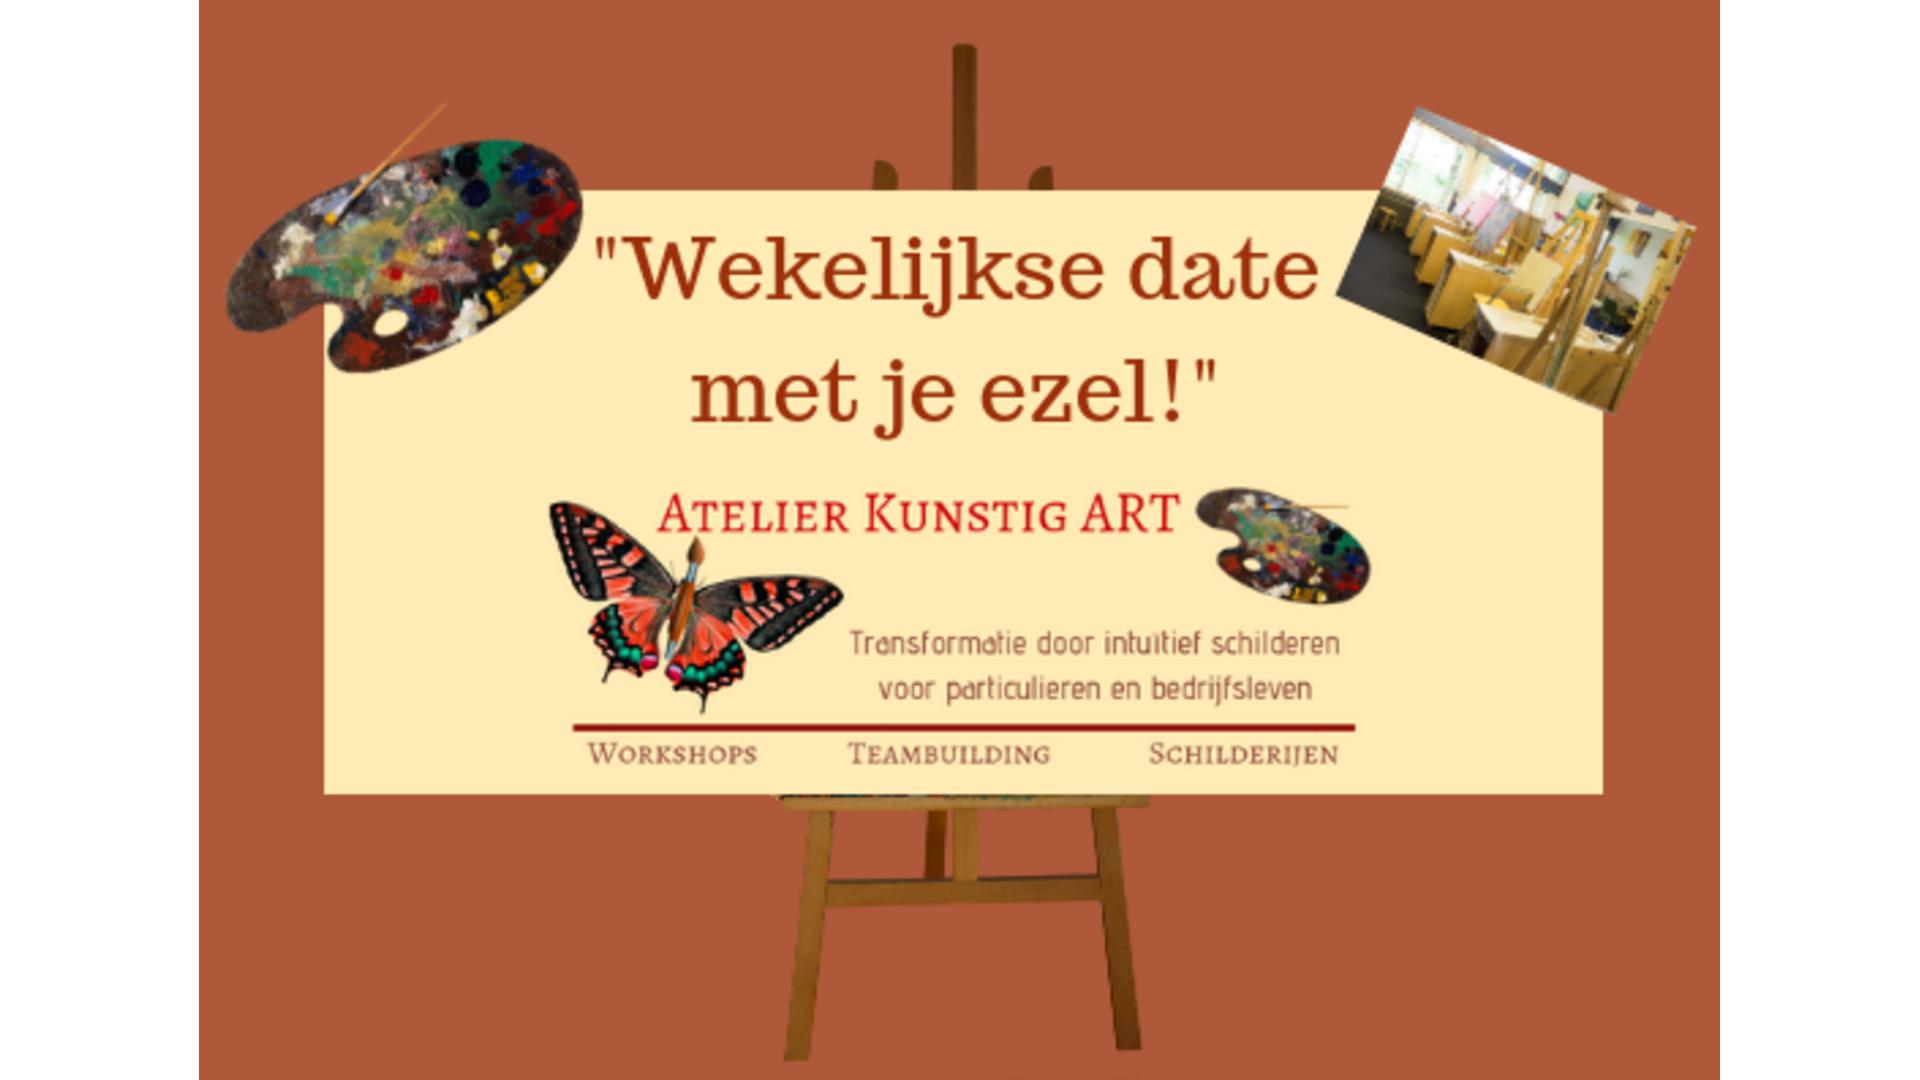 Atelier Kunstig Art